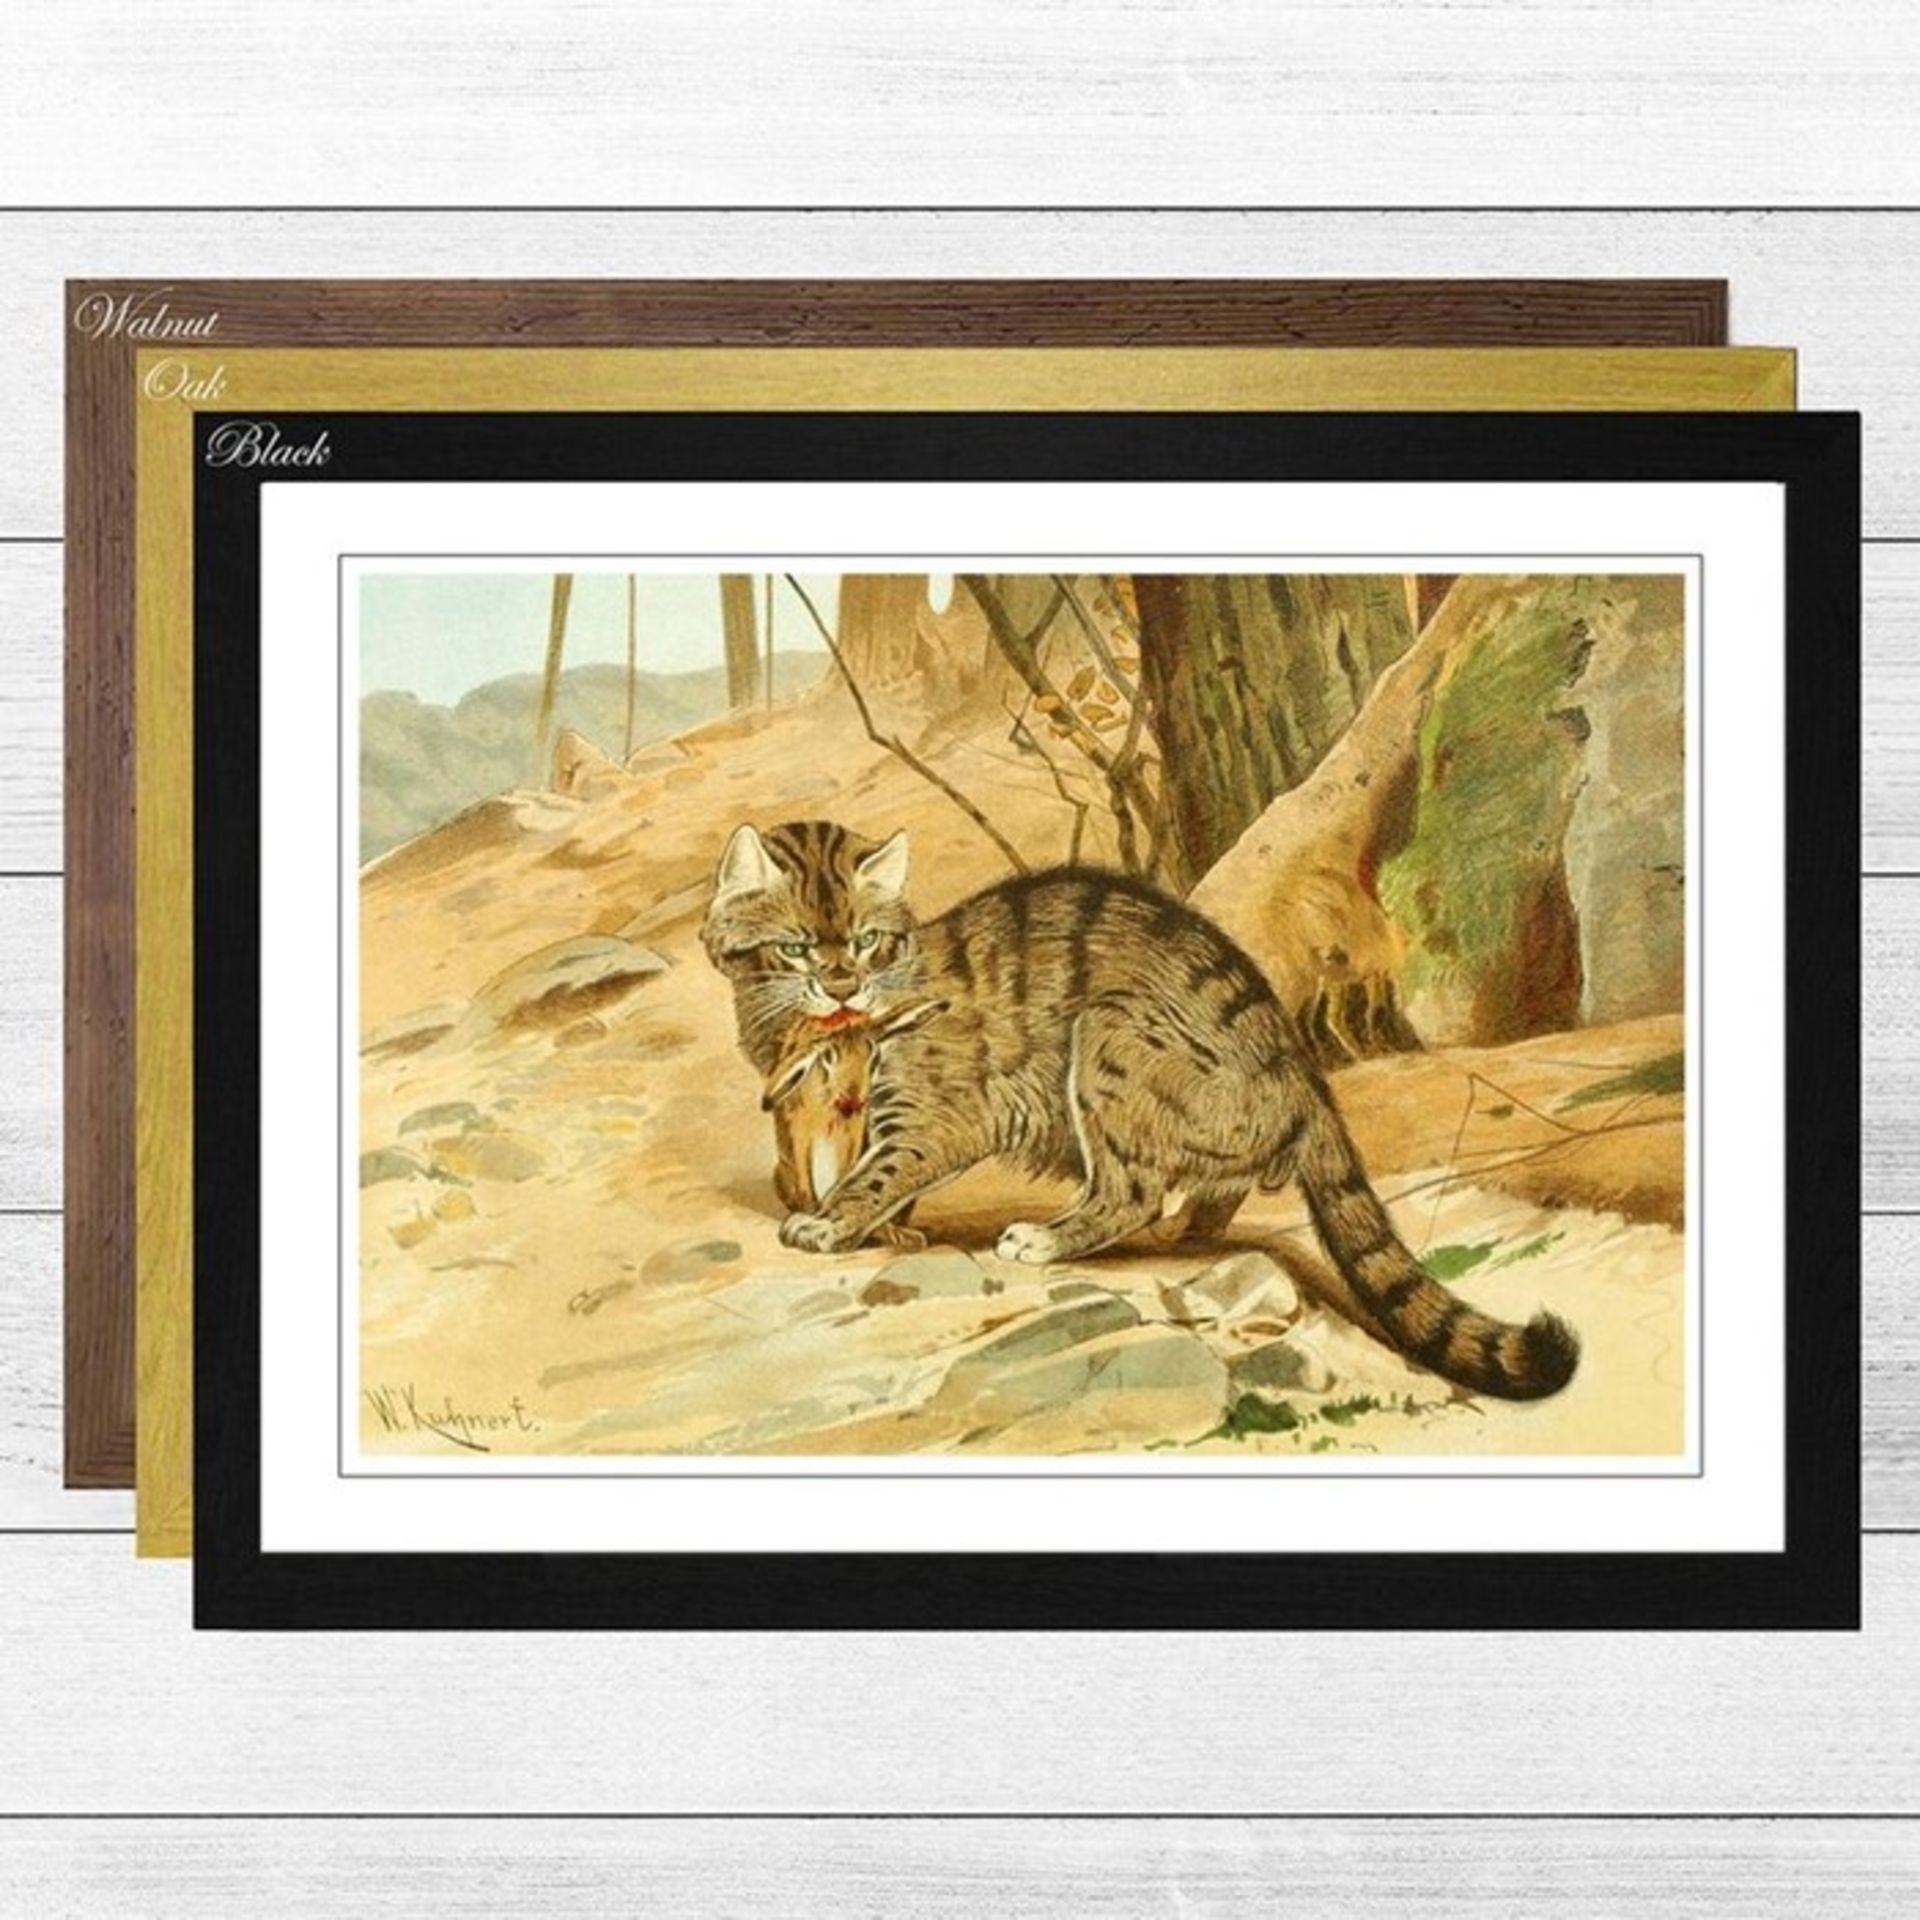 East Urban Home, Vintage Wild Cat (2)' by Wilhelm Kuhnert Framed Painting Print (BLACK FRAME) -